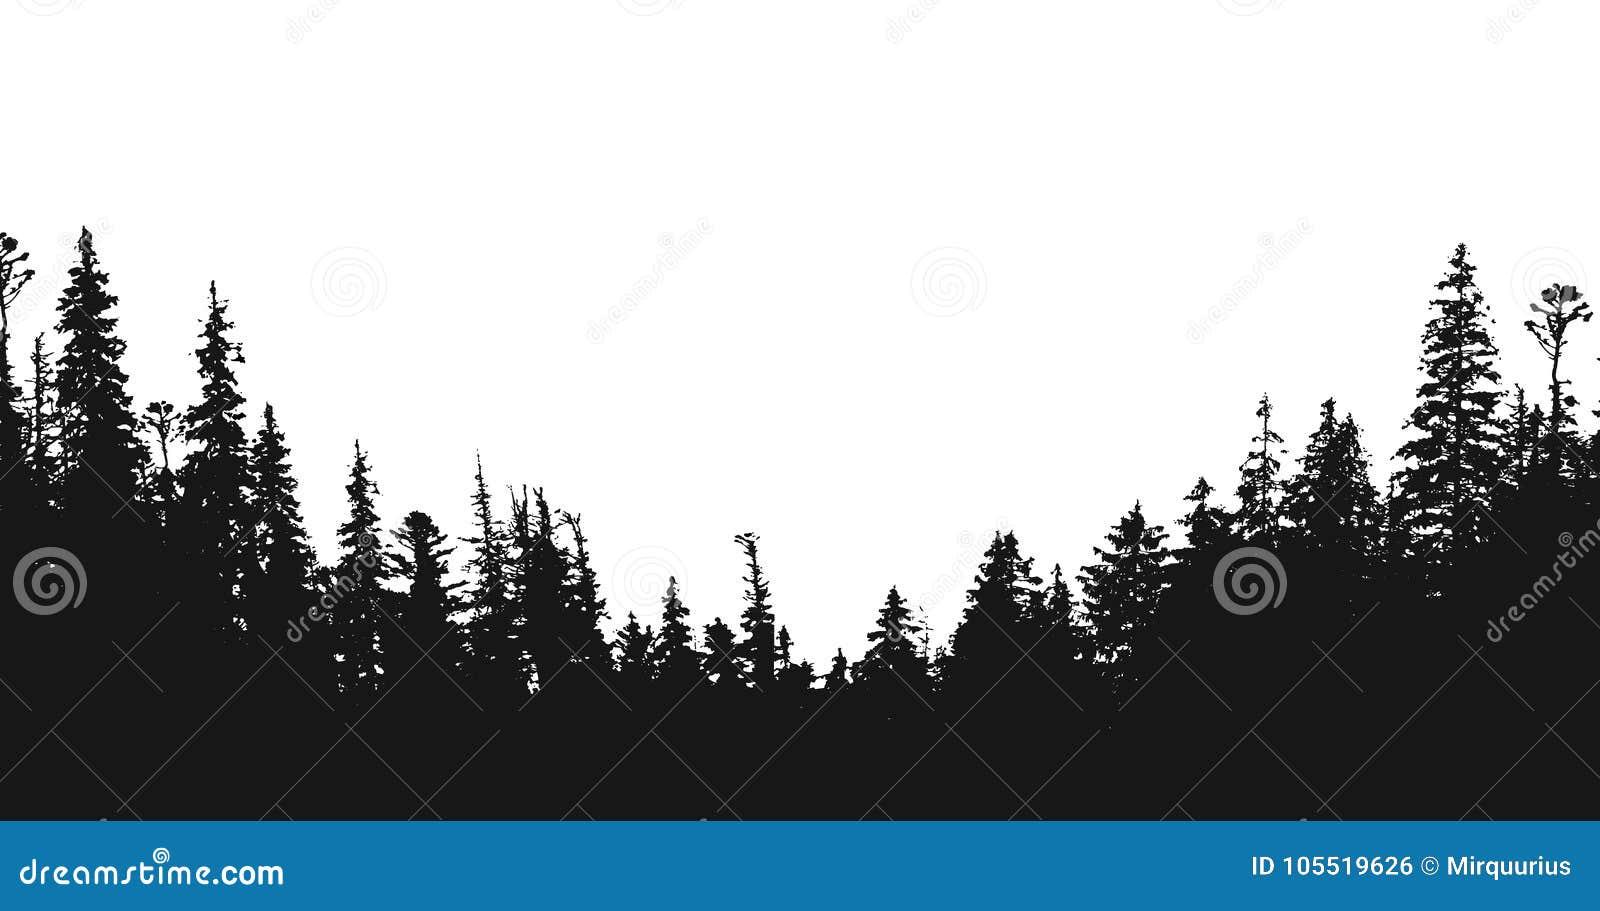 Contexto de la silueta del bosque